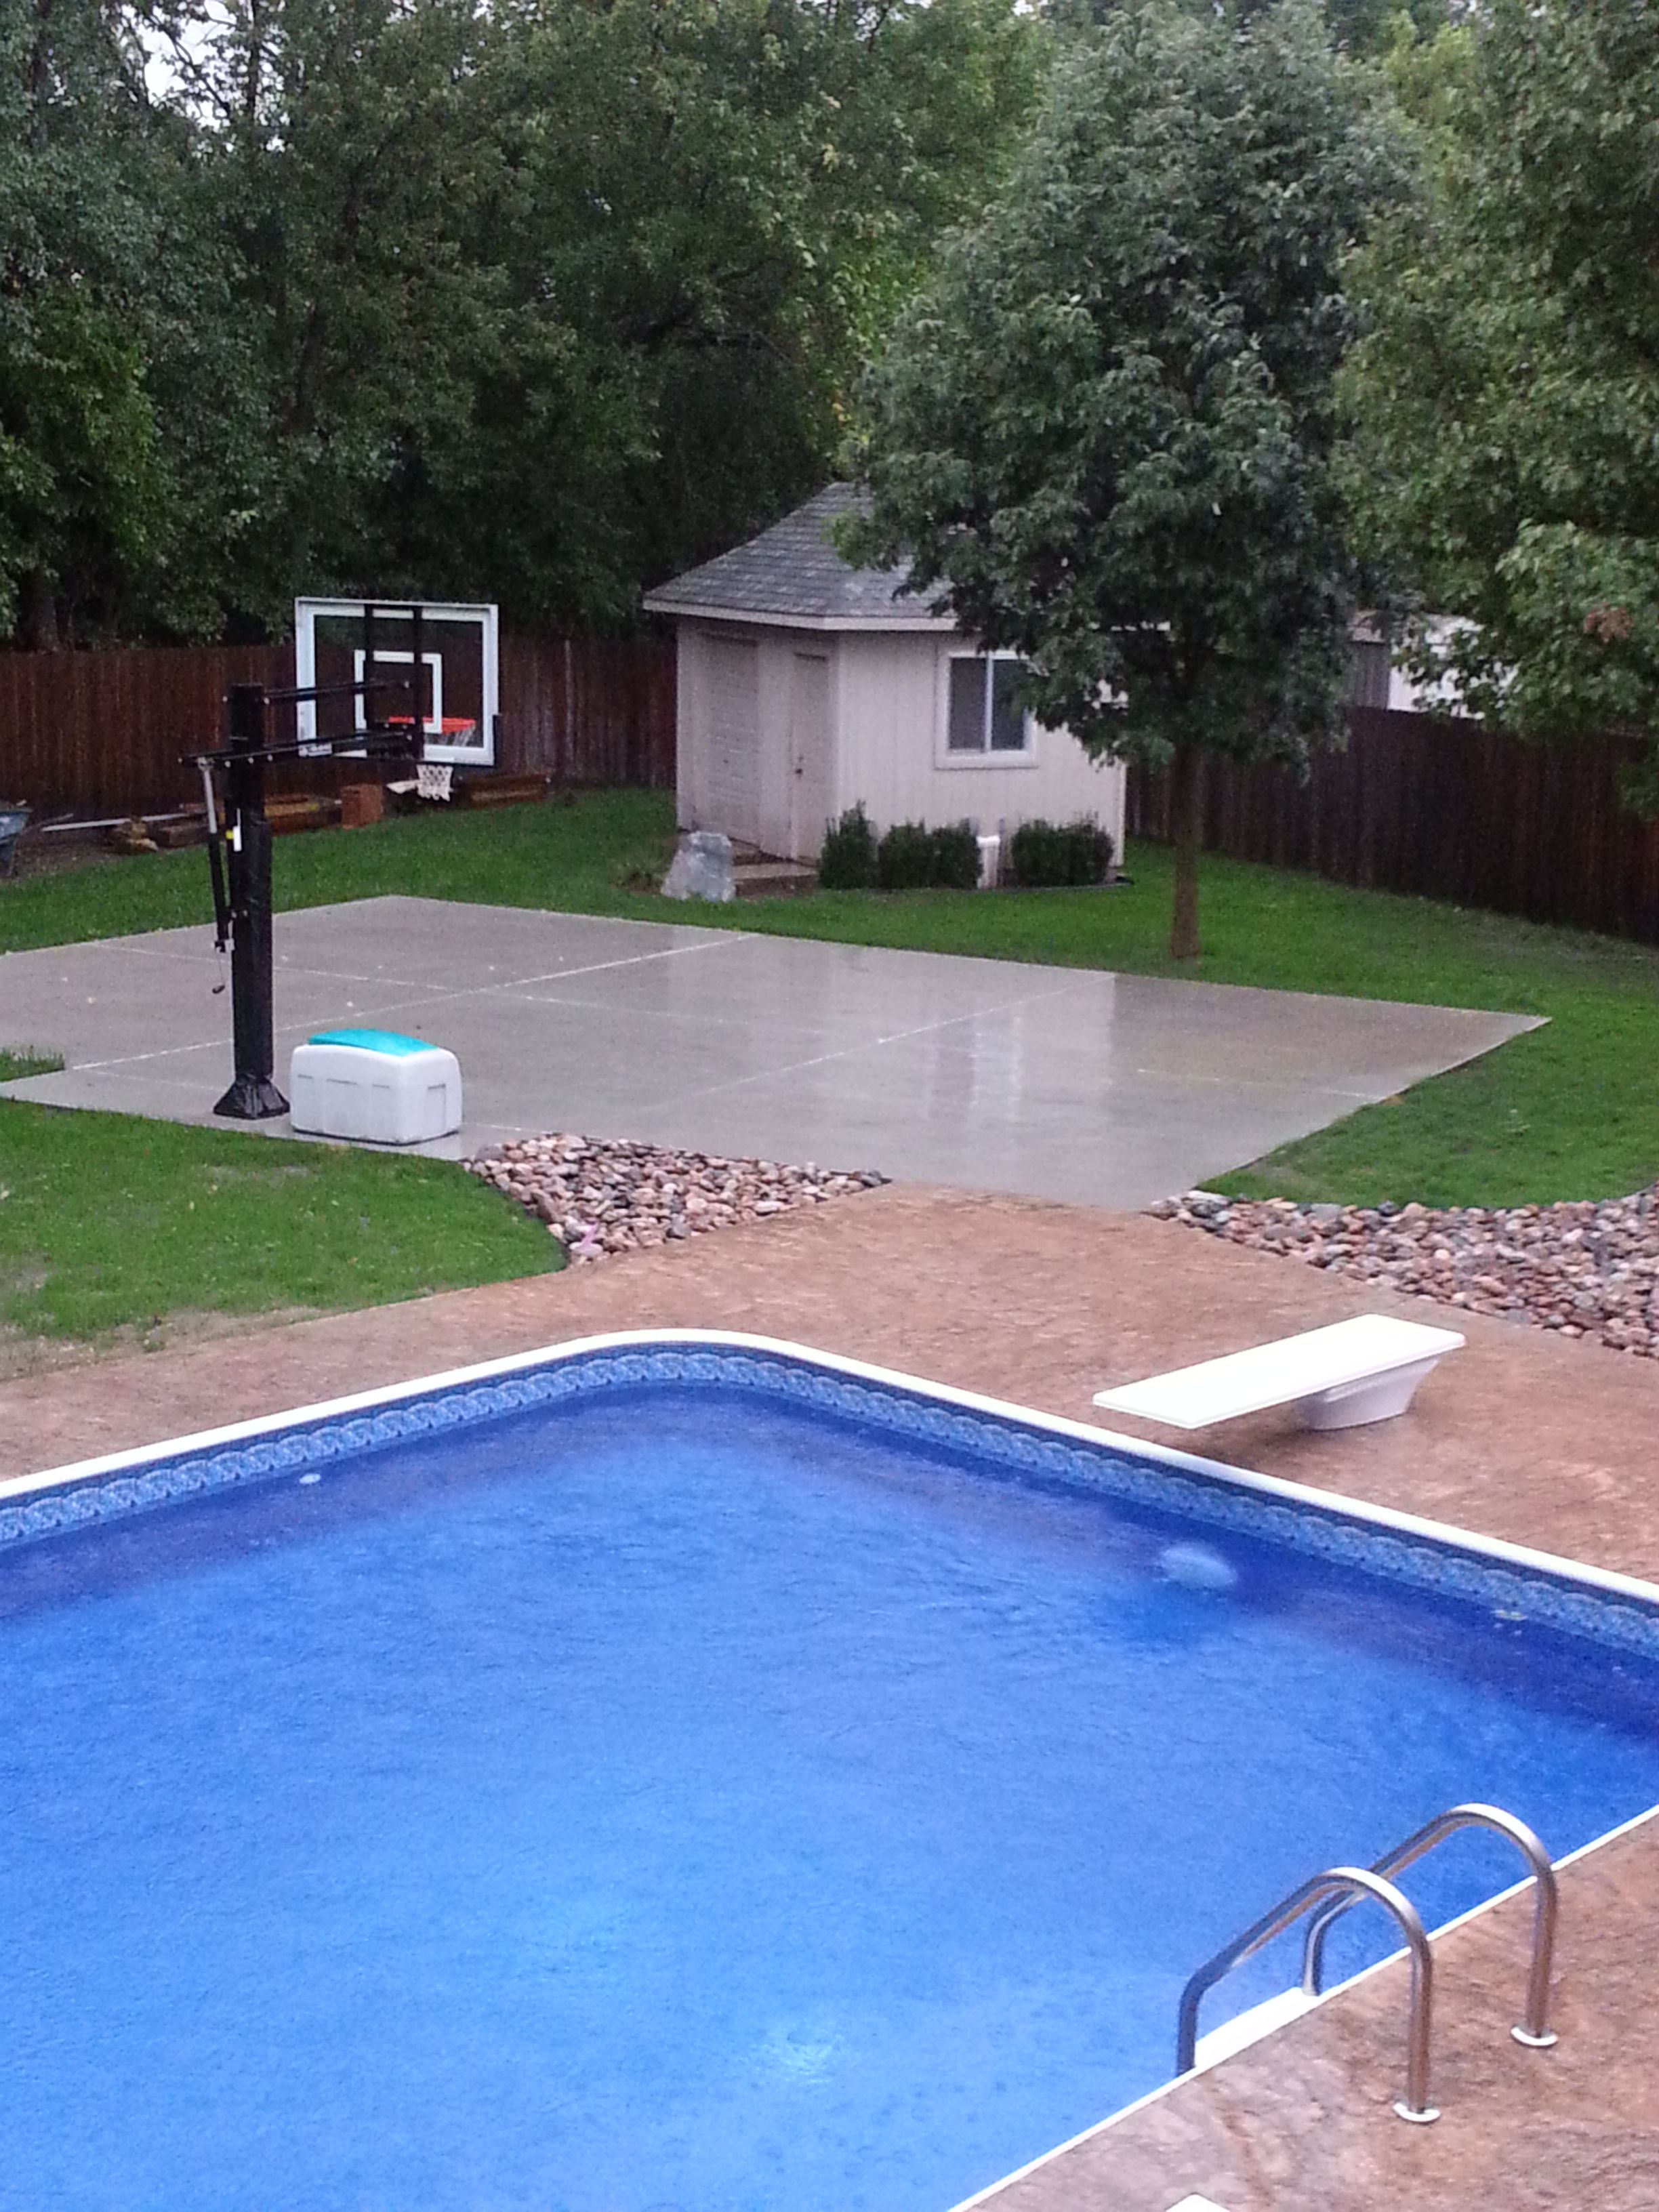 Dream House With Basketball Court And Pool Novocom Top